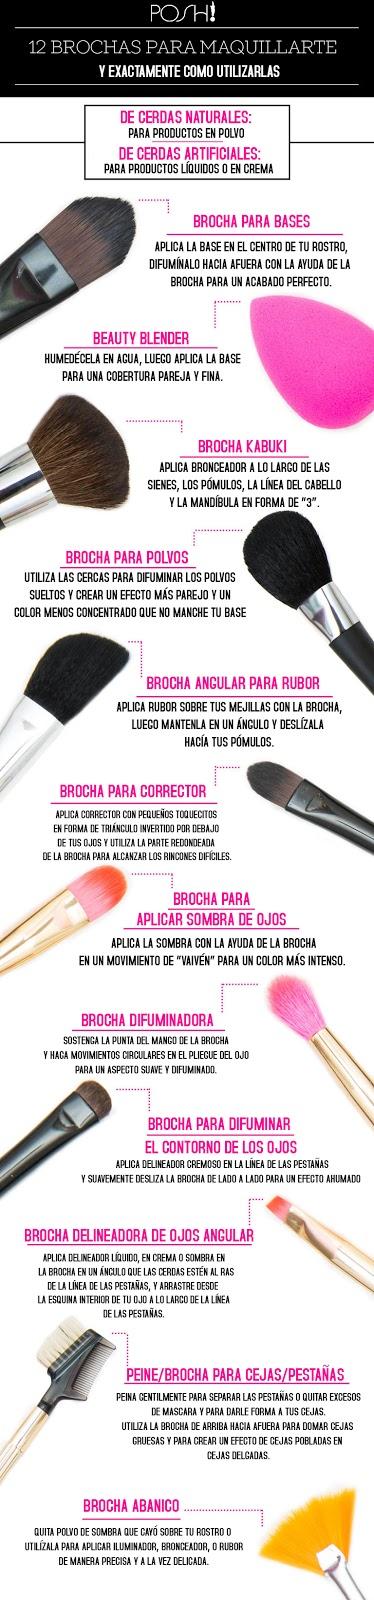 12 Brochas Que No Deben Faltar En Tu Cosmetiquera Maquillaje Increíble Maquillaje De Belleza Tips Belleza